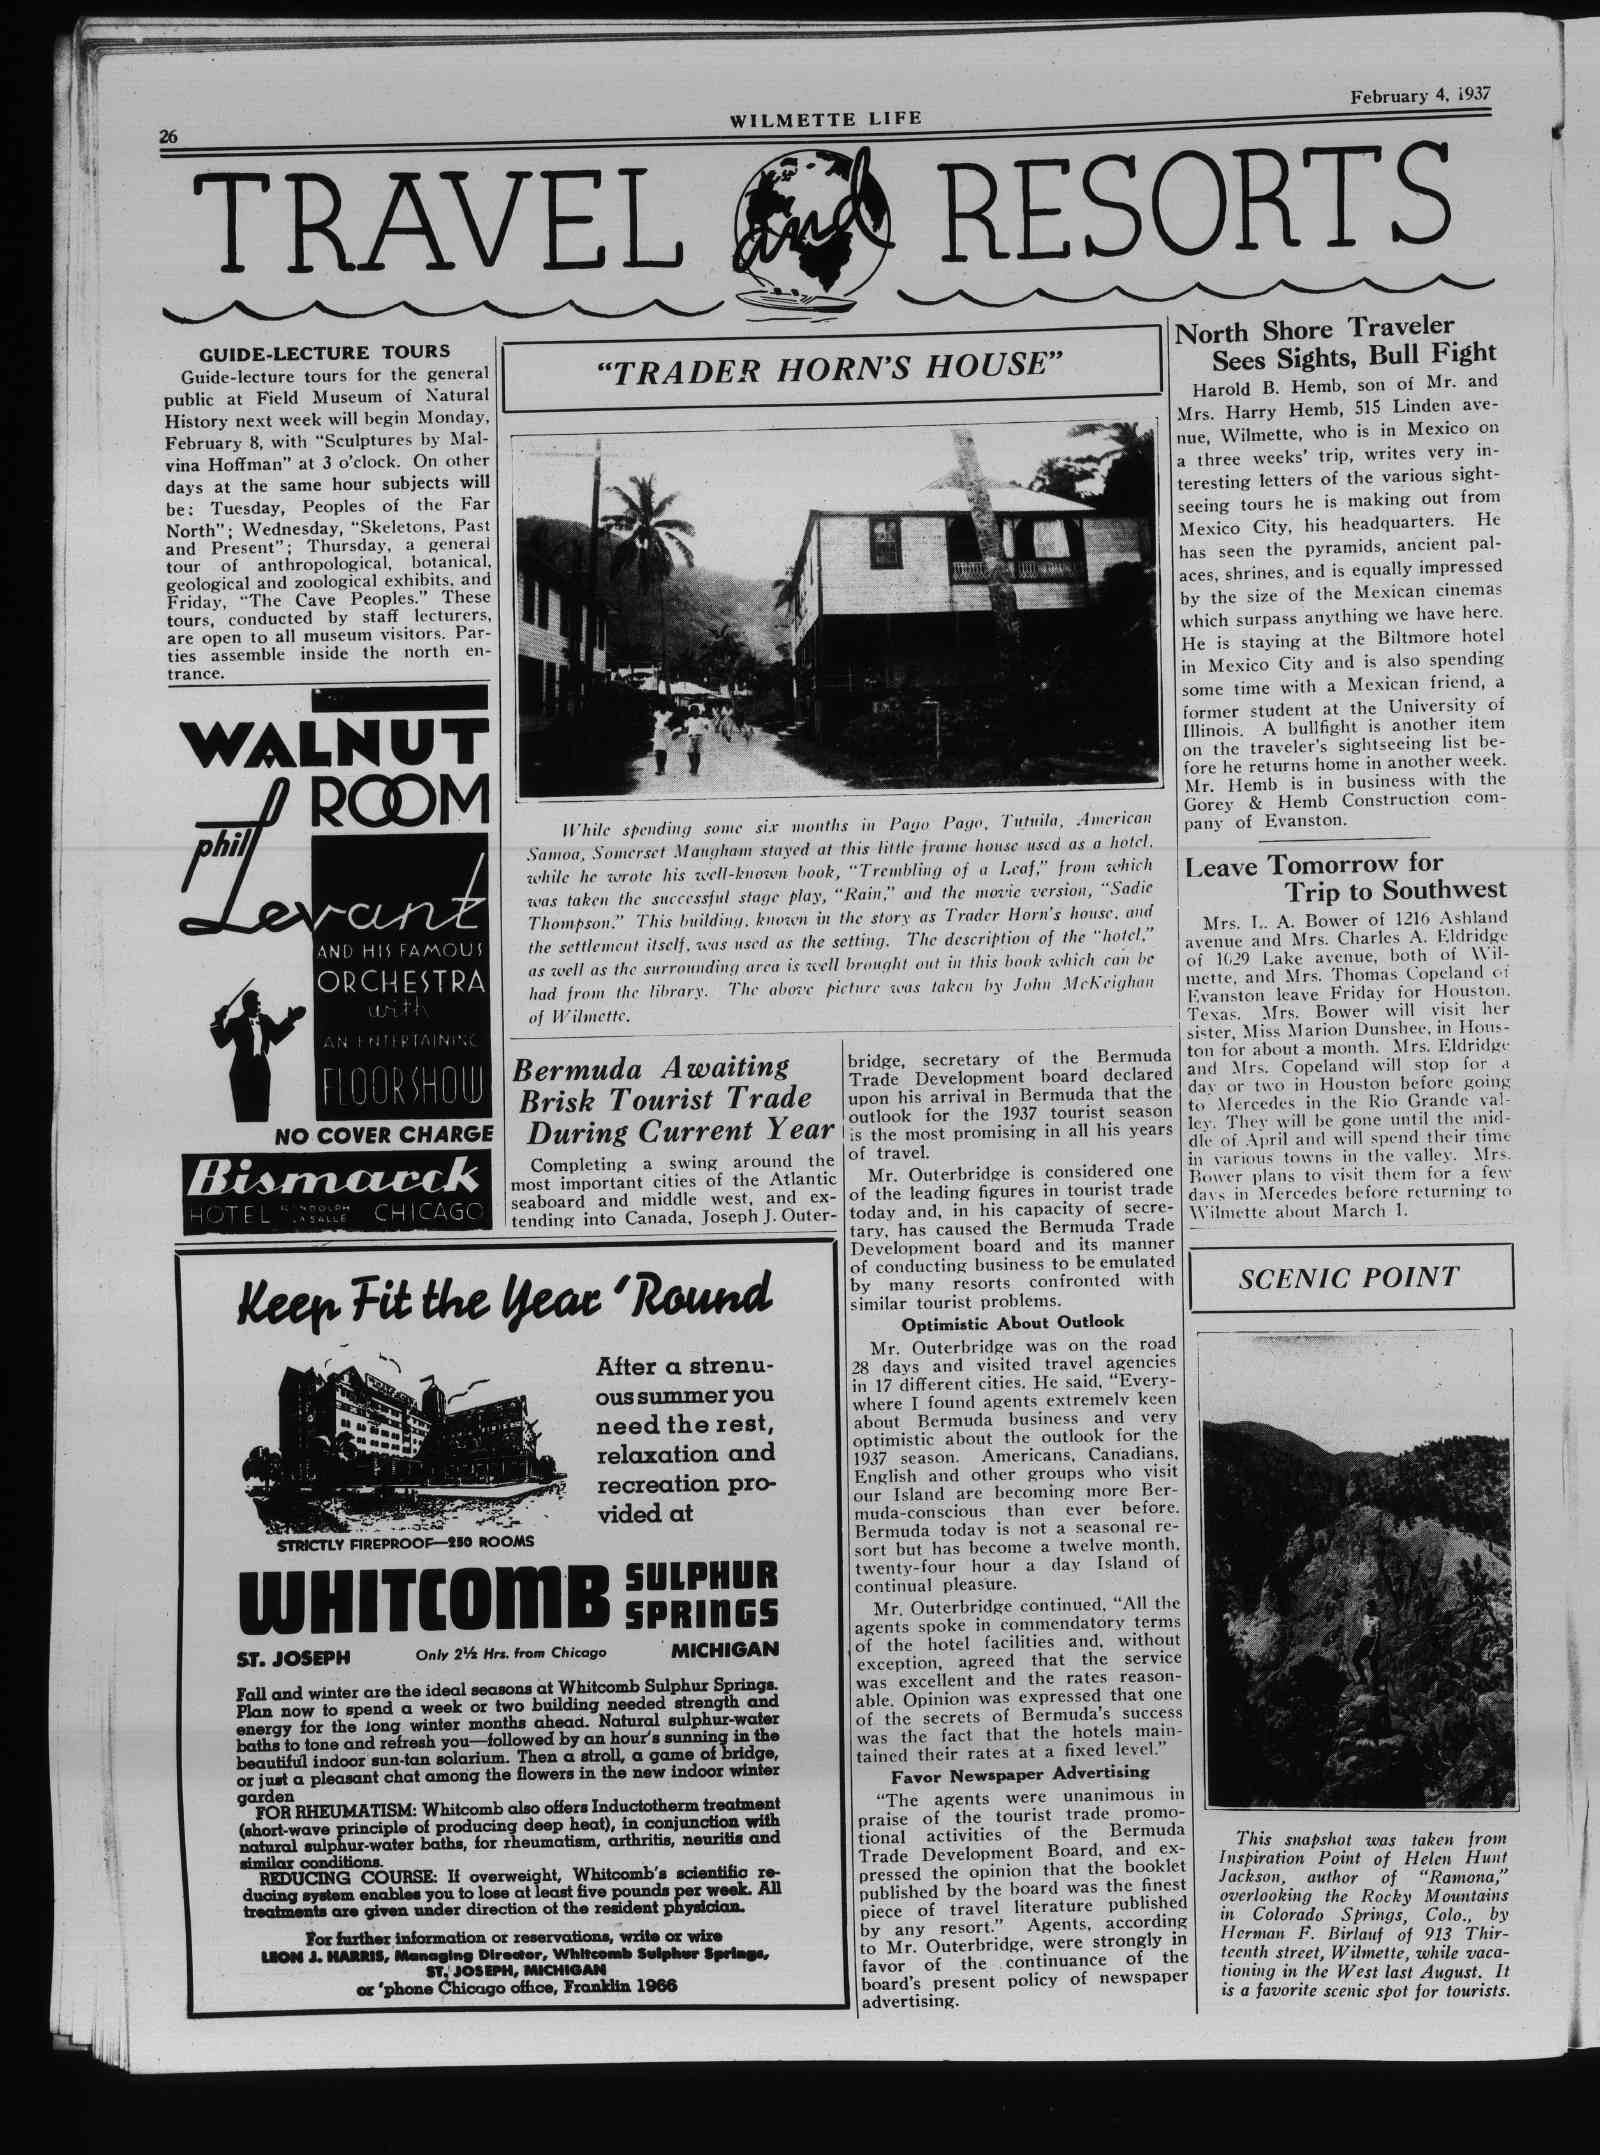 Wilmette Life (Wilmette, Illinois), 4 Feb 1937